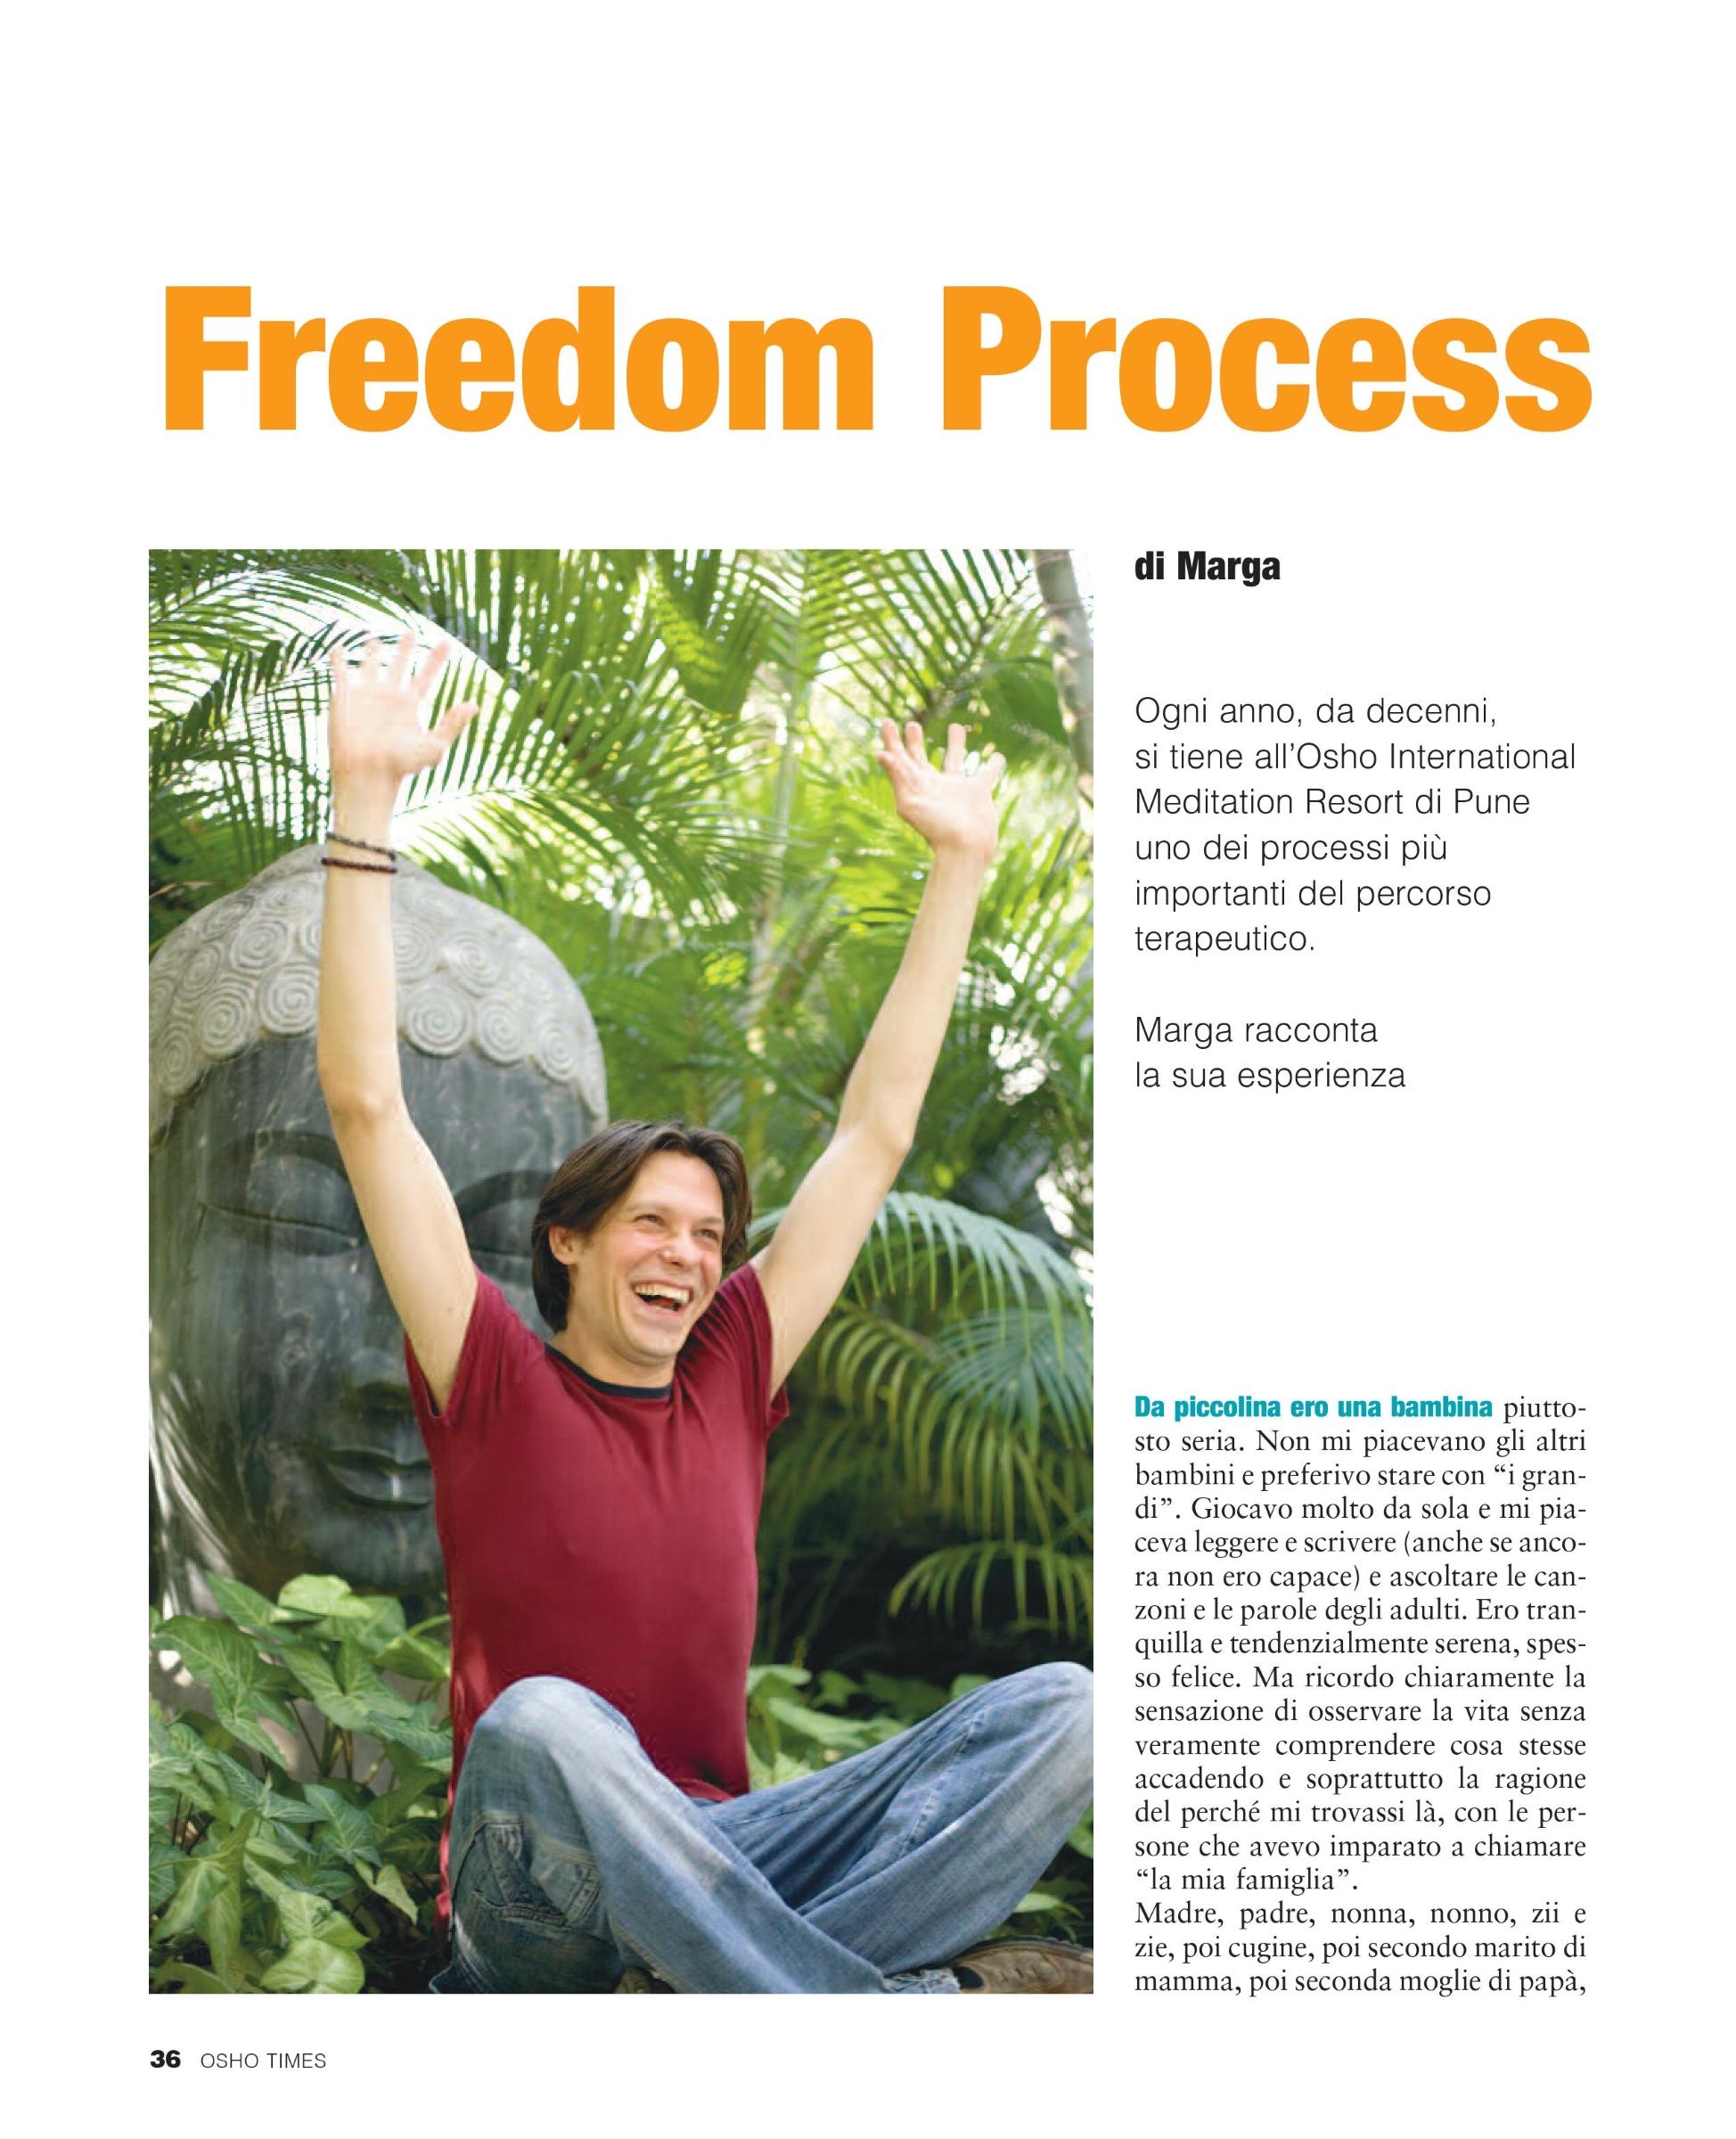 Marga - AFH - The OSHO Freedom Process 1